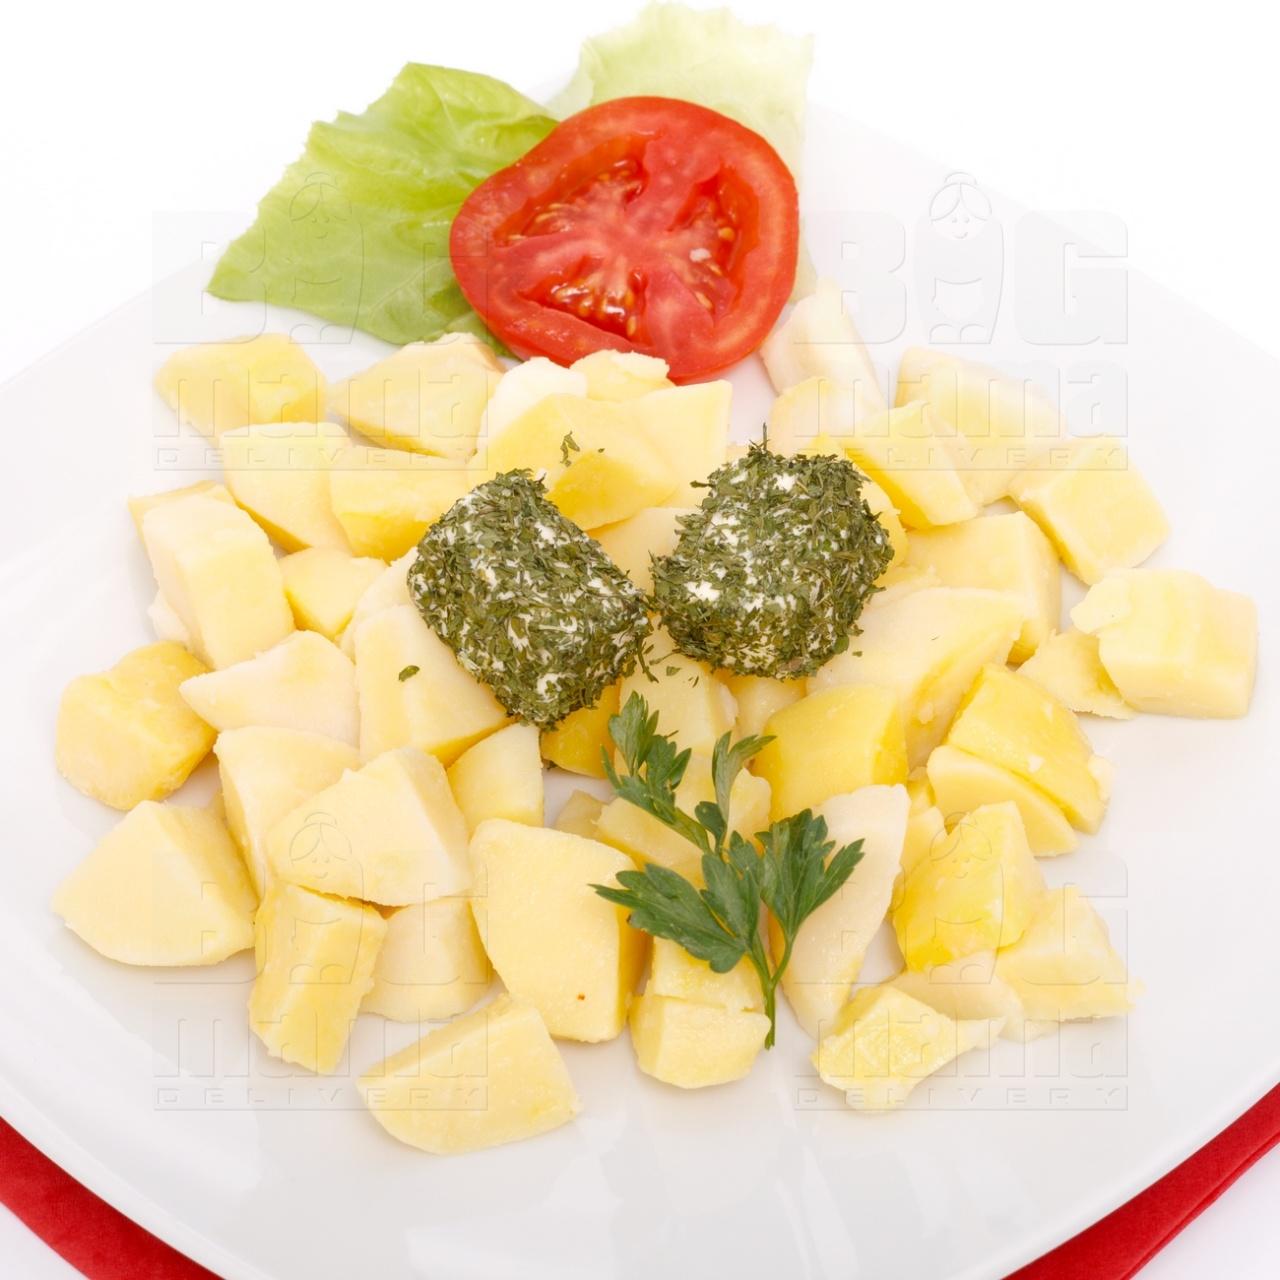 Product #36 image - Cartofi natur